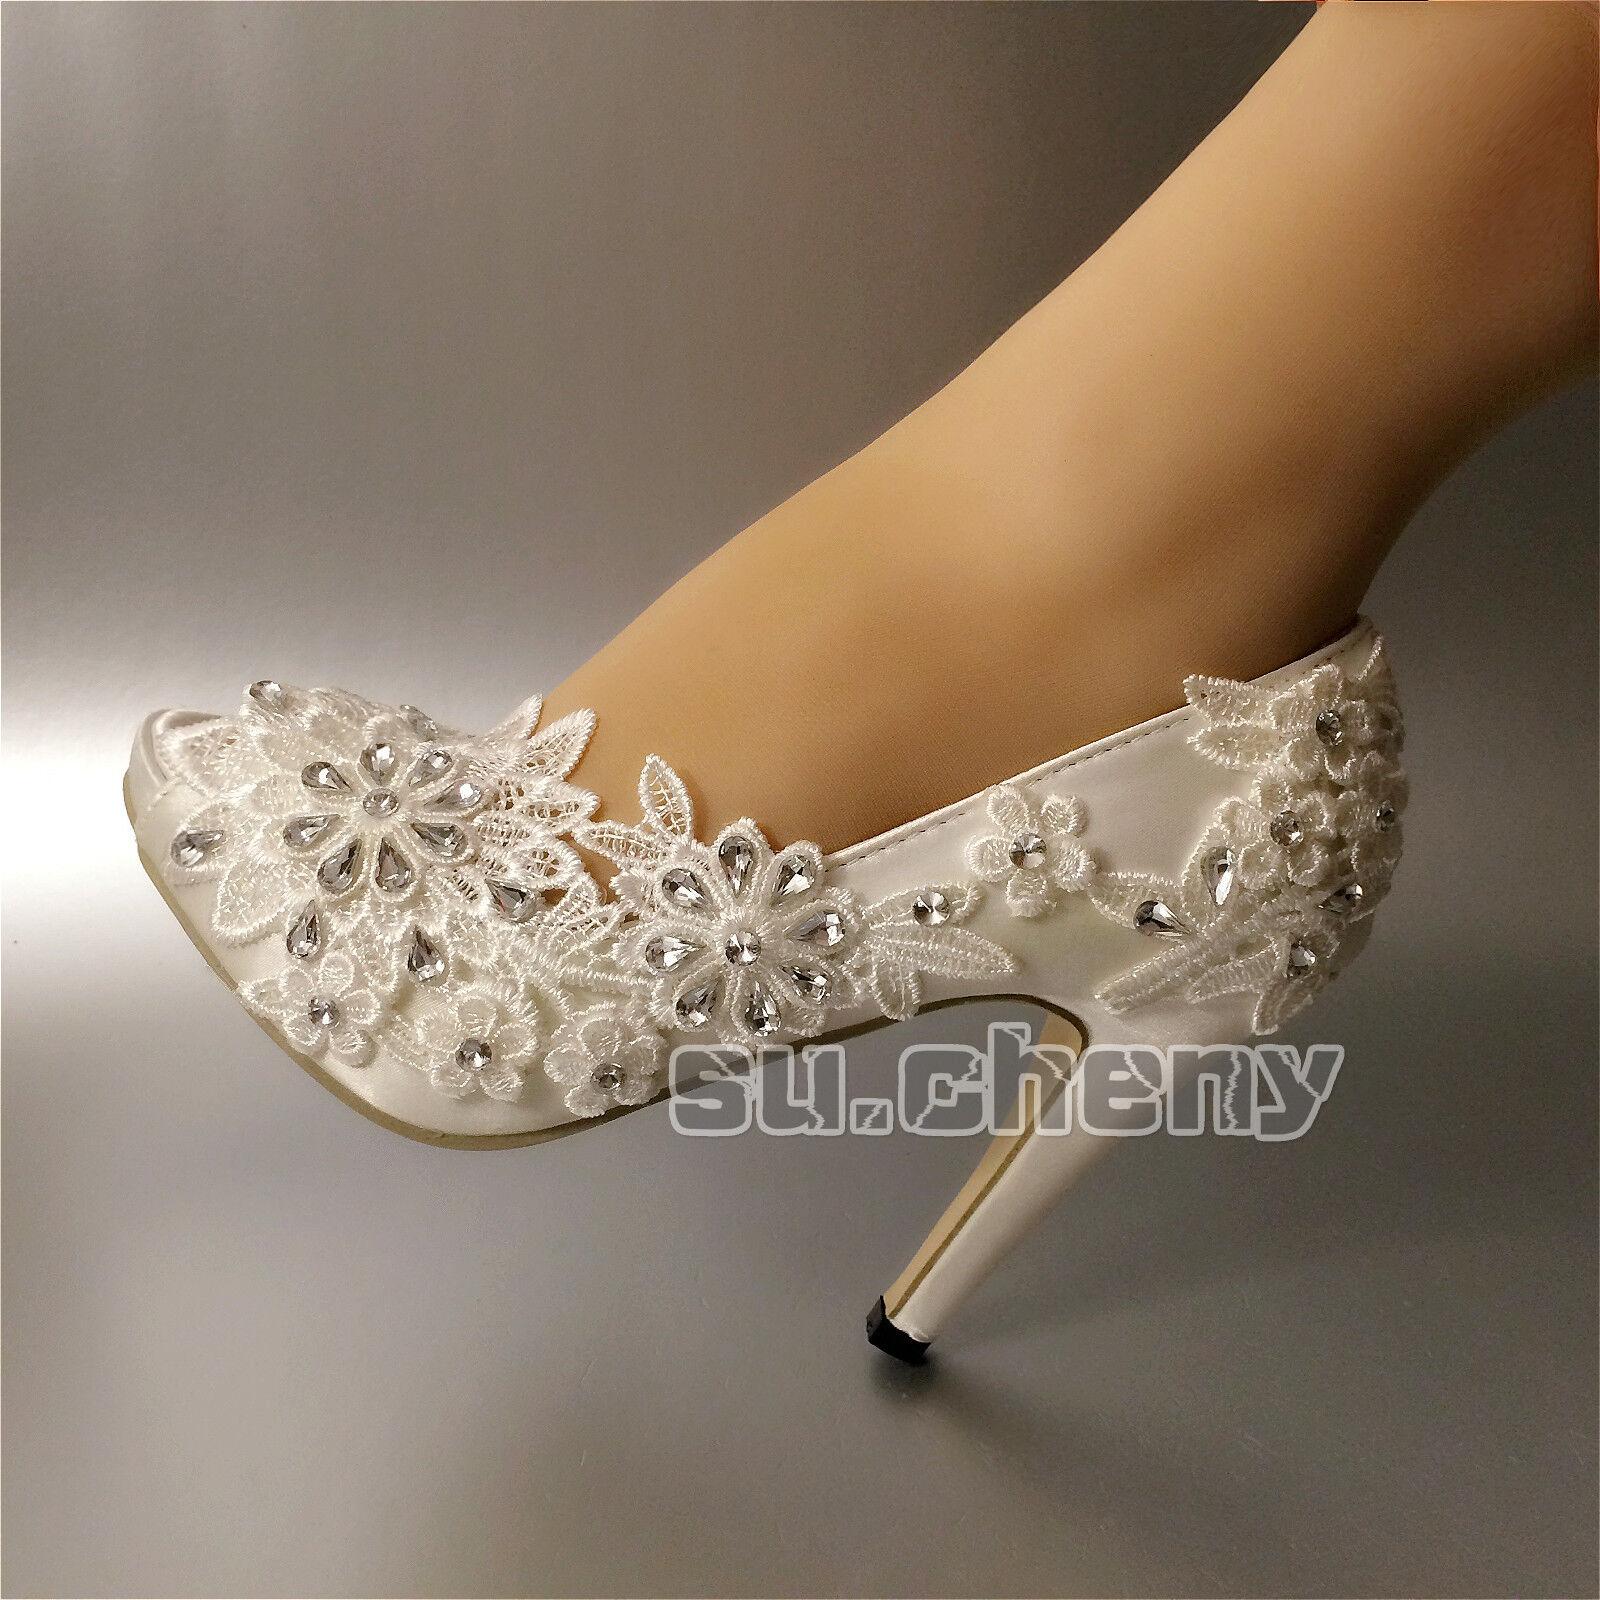 RHINESTONES satin WEISS ivory lace open toe Wedding schuhe bridal heel Größe 5-11